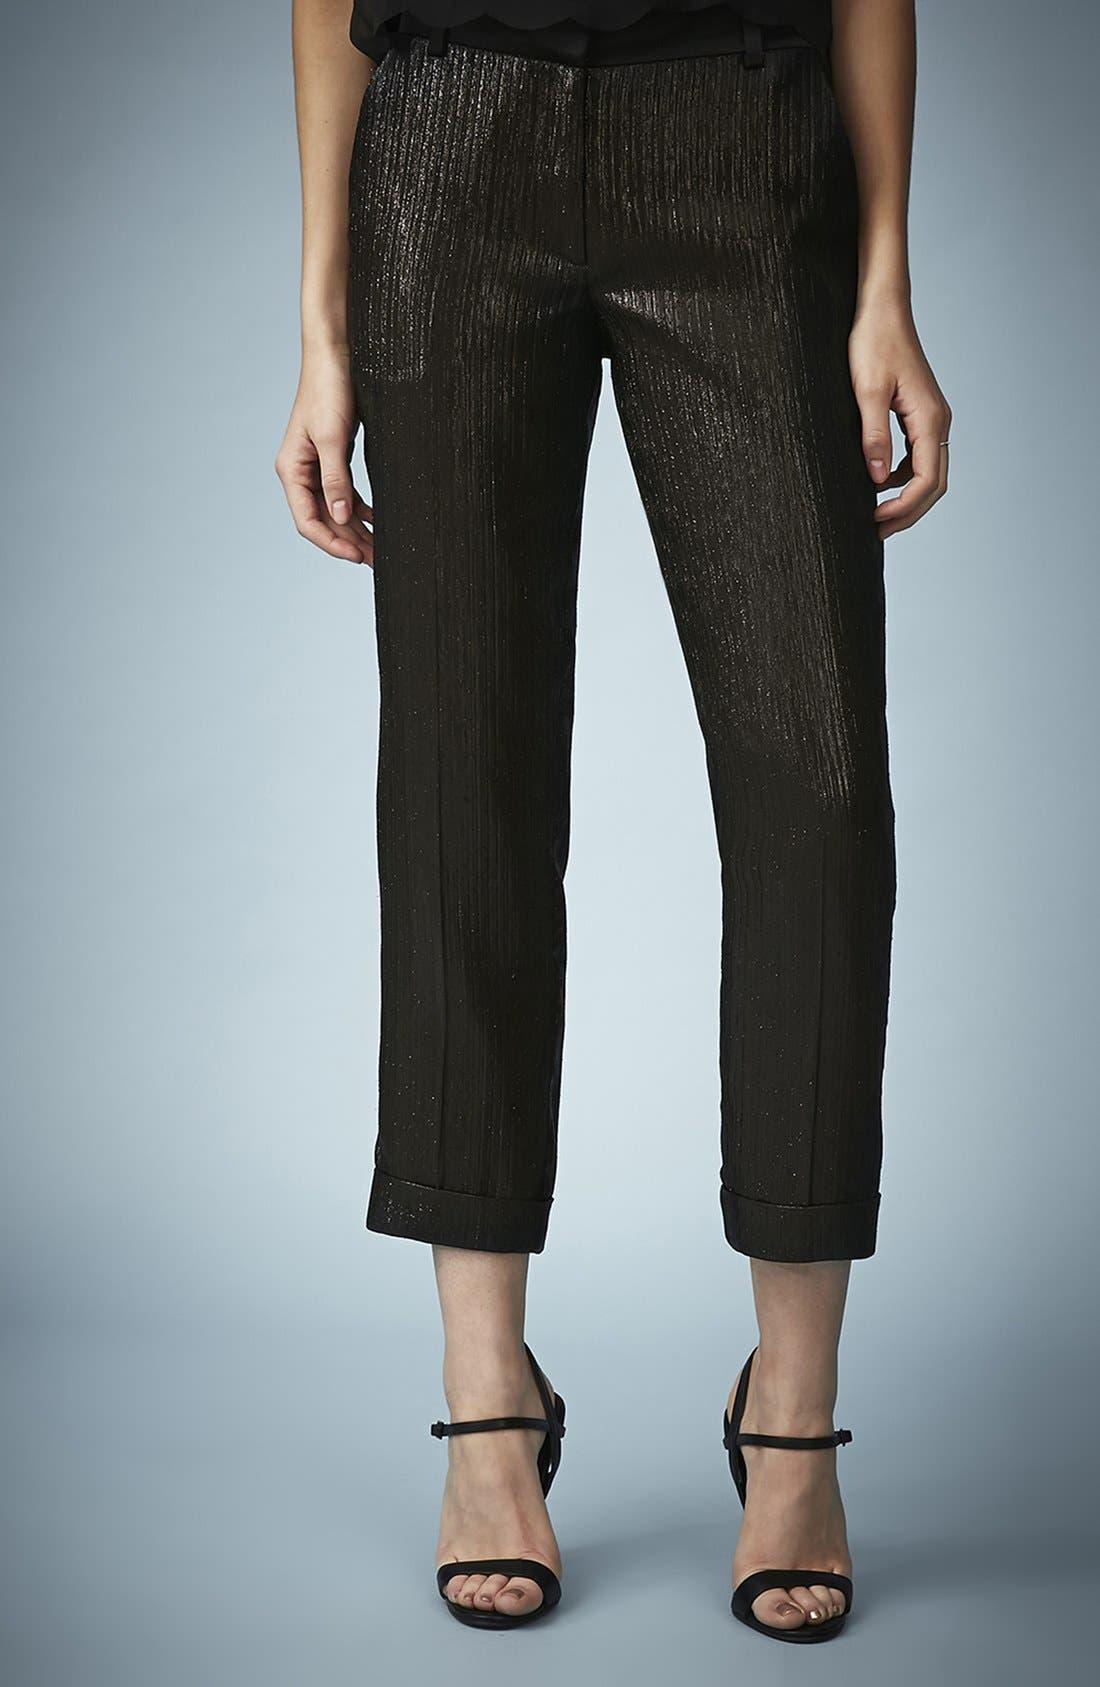 Main Image - Kate Moss for Topshop Lamé Tuxedo Pants